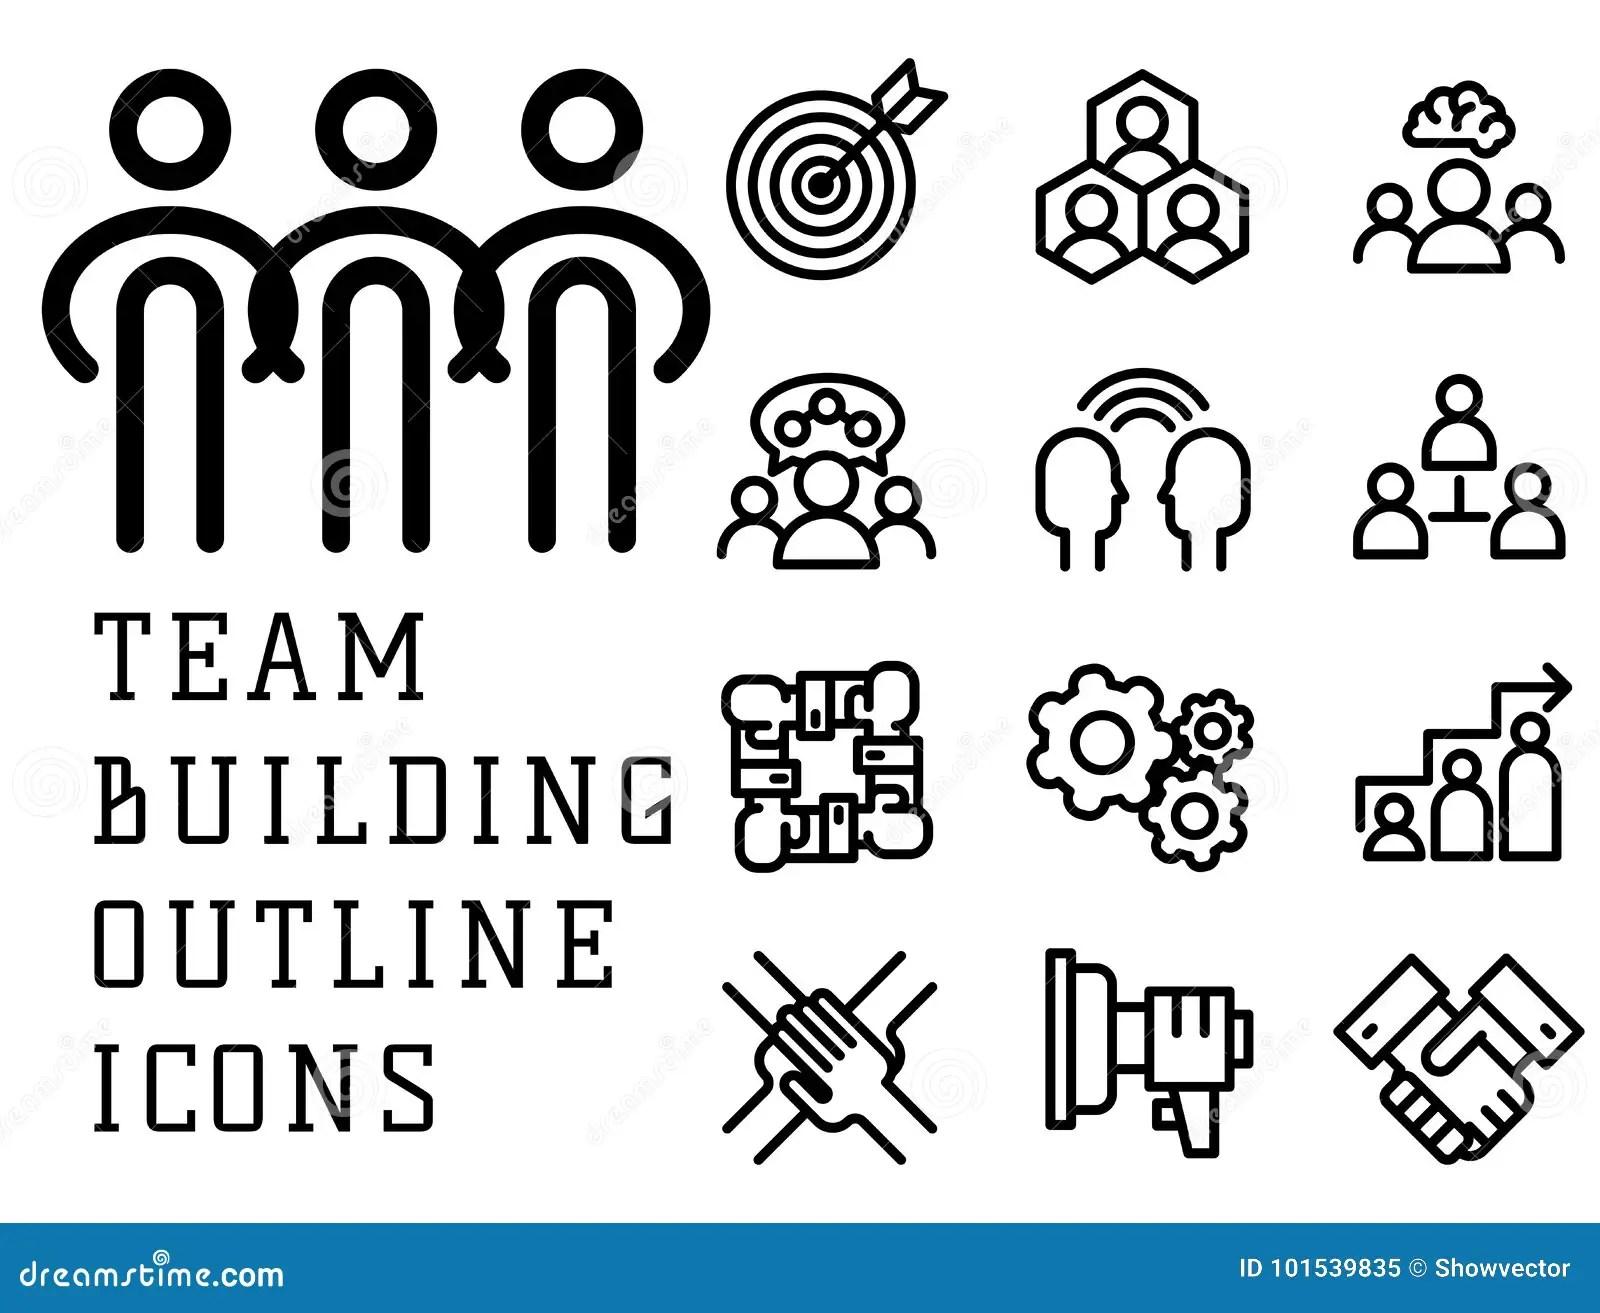 Teambuilding Cartoons Illustrations Amp Vector Stock Images